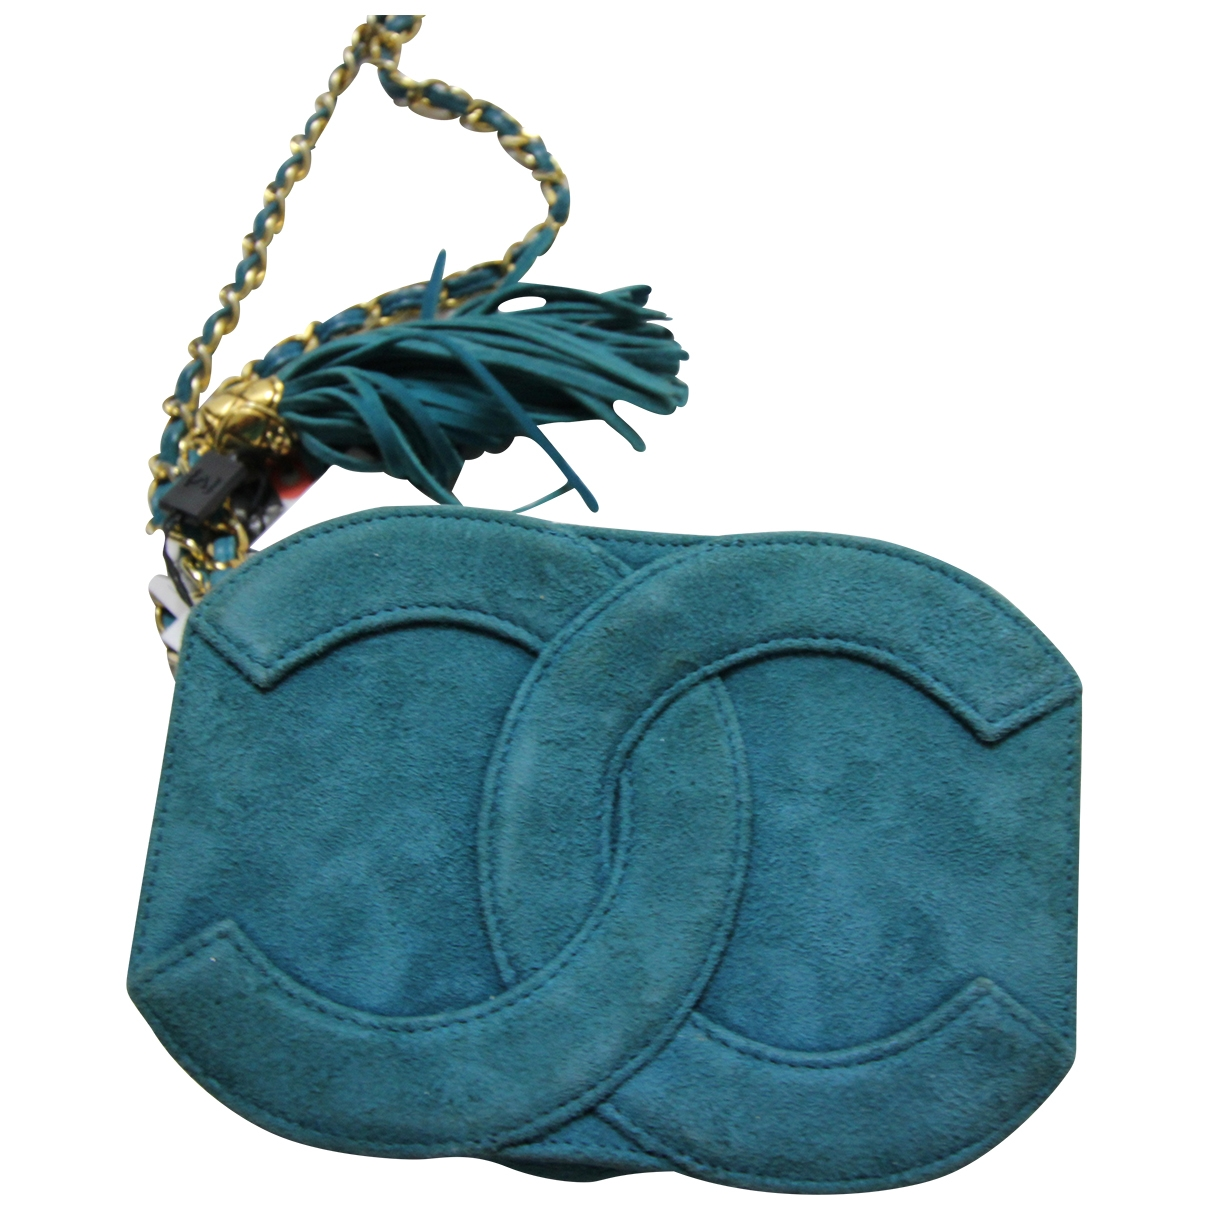 Chanel \N Suede handbag for Women \N